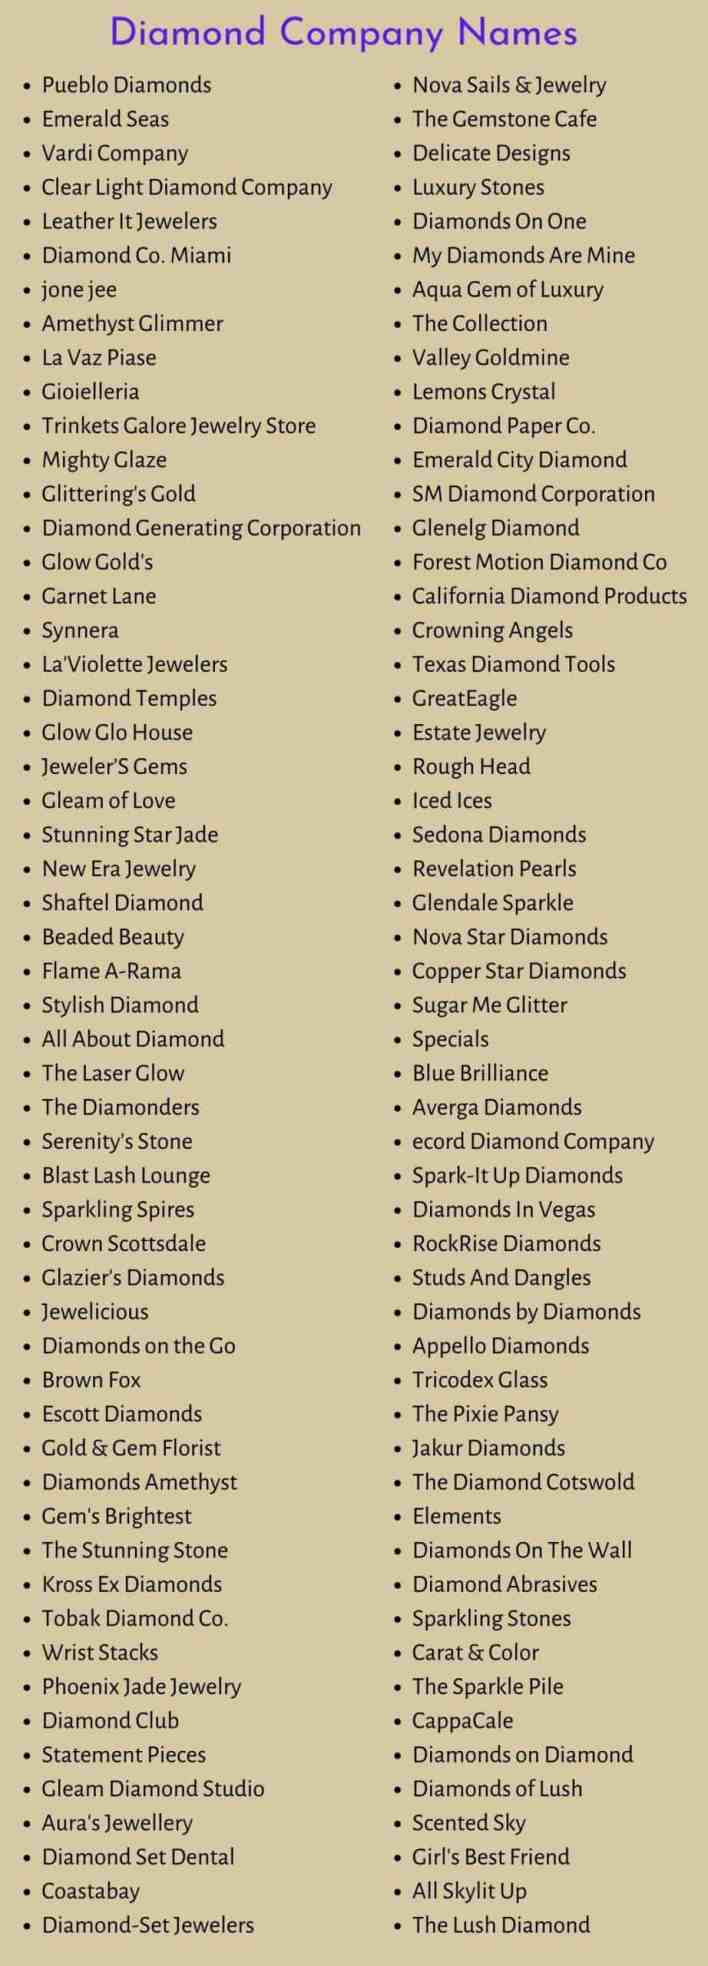 Diamond Company Names